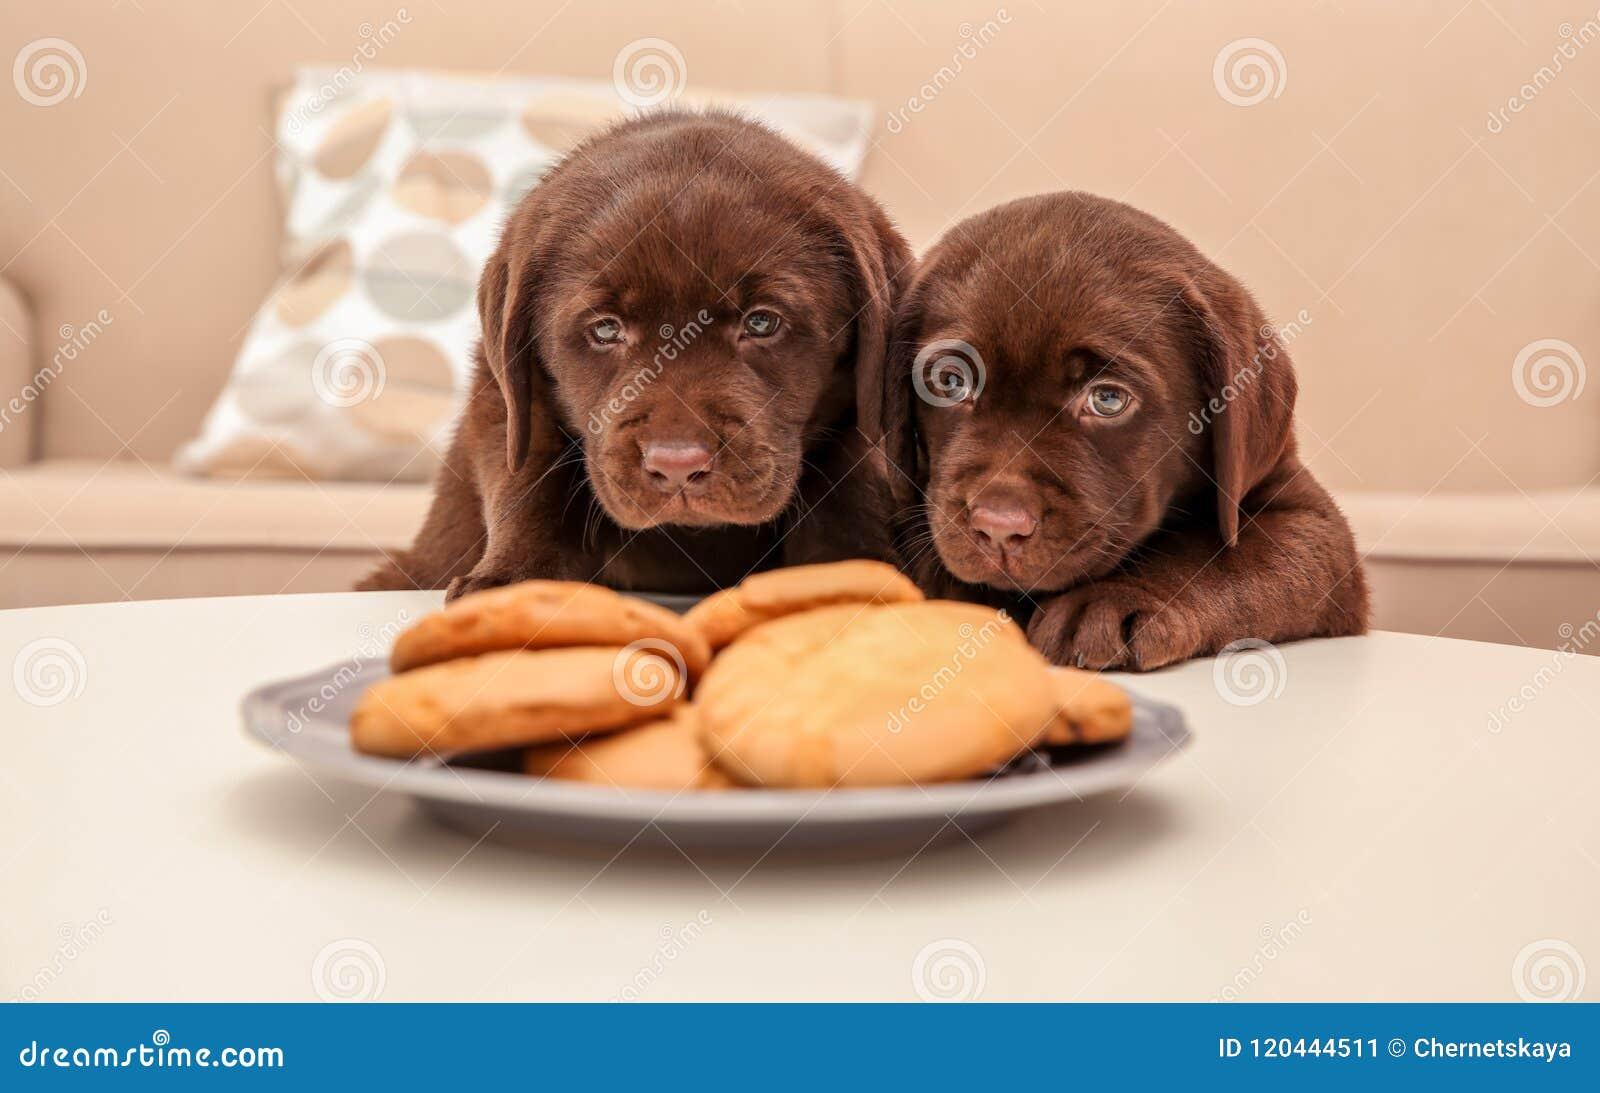 Chocolate Labrador Retriever puppies near cookies indoors